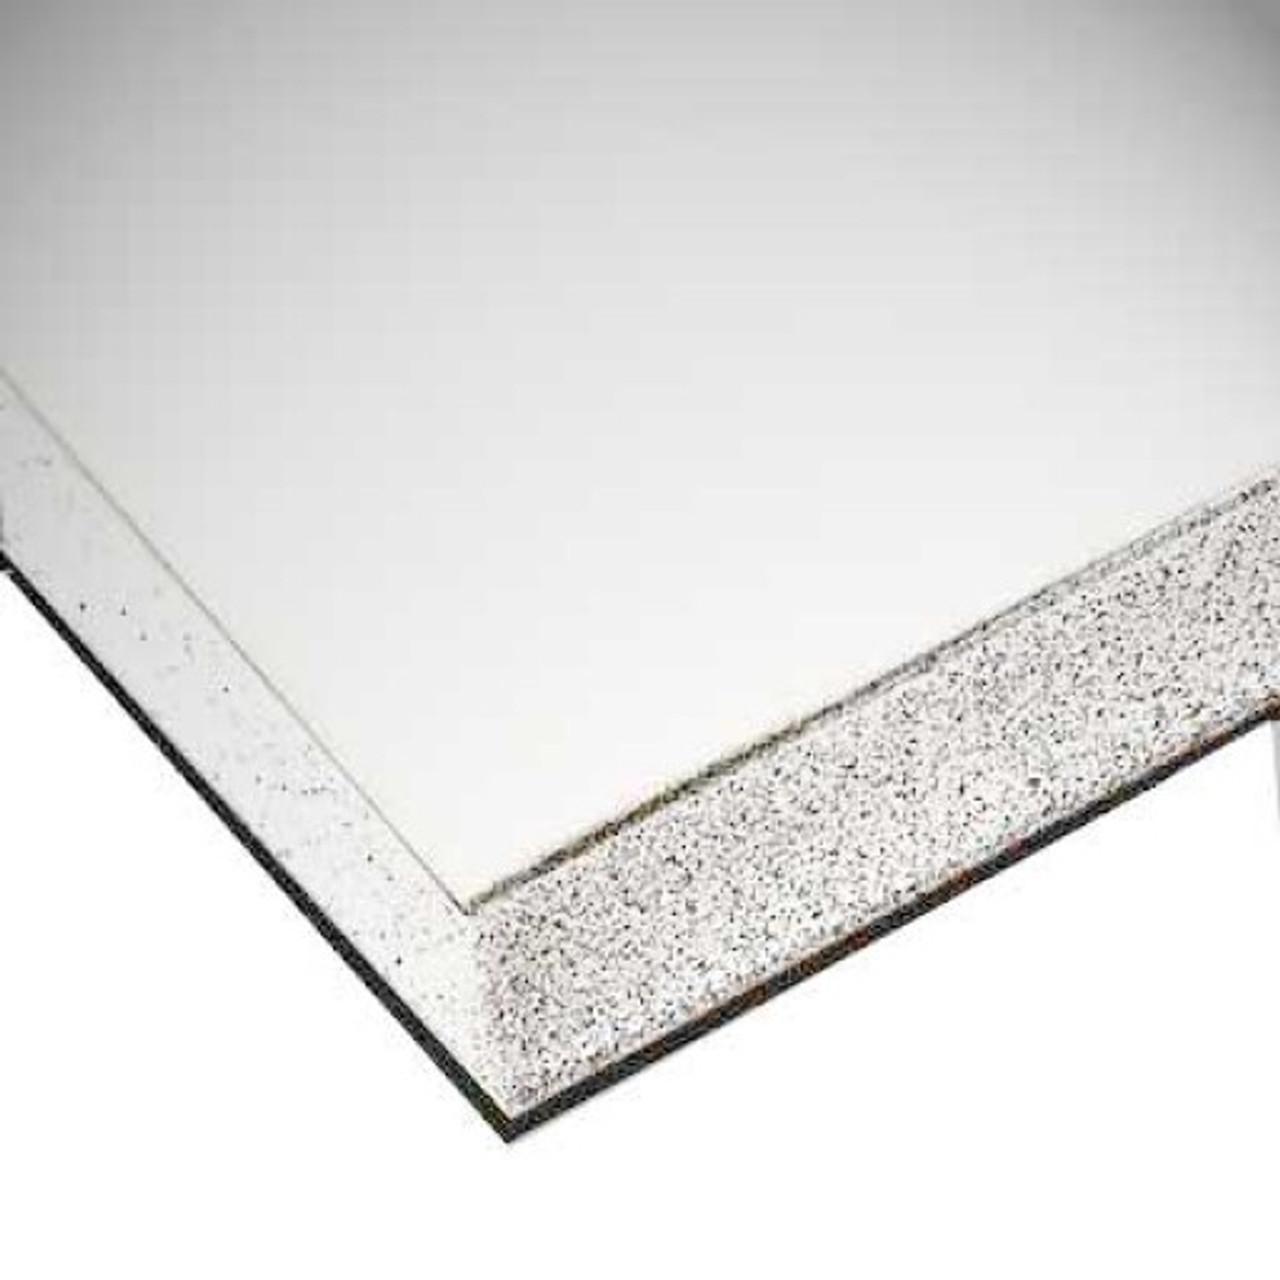 "Gator Board - White - 4' X 8' X 3/16"""